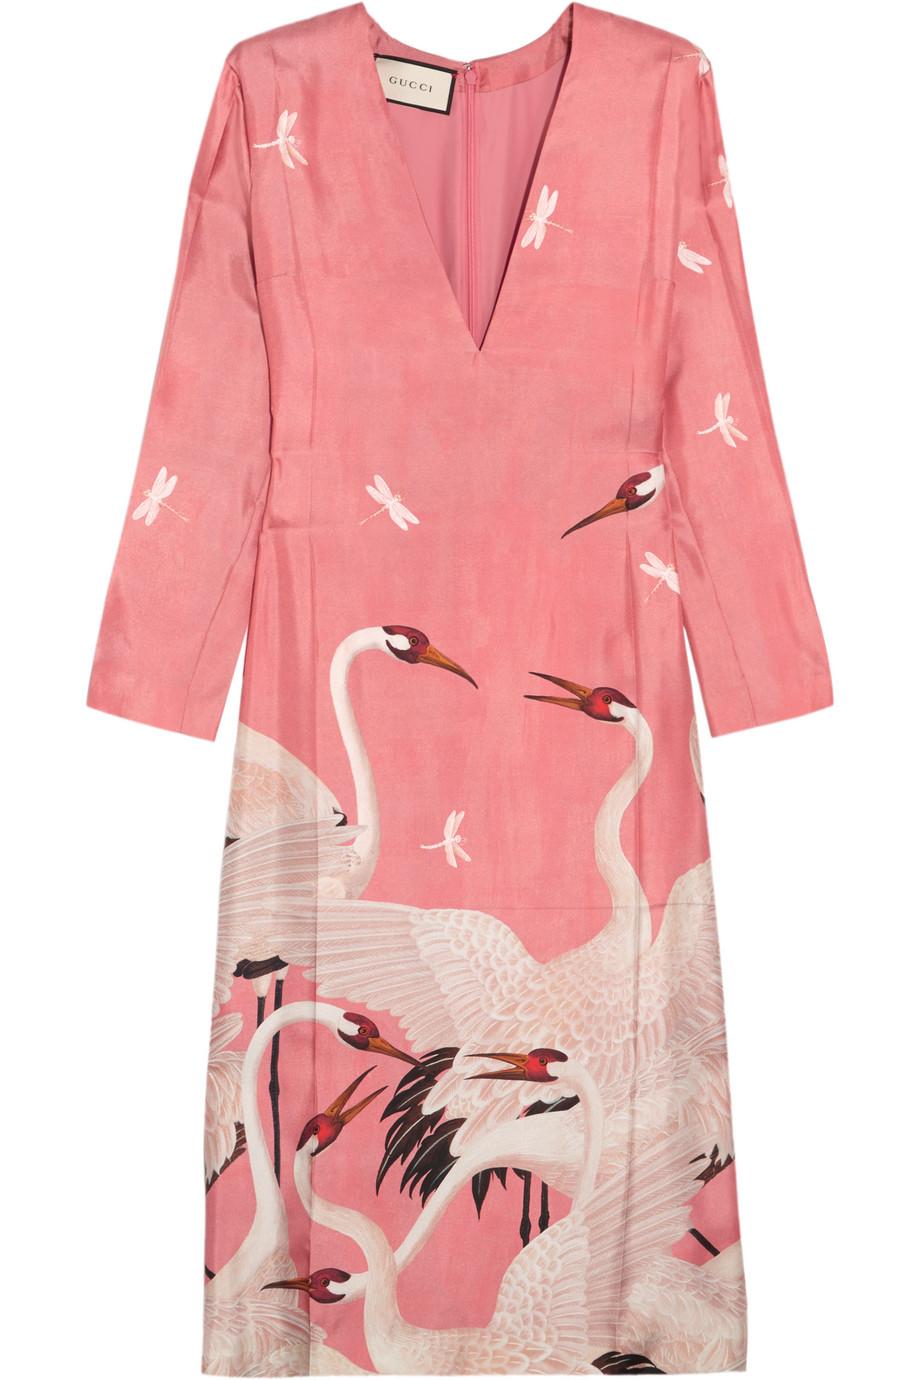 Gucci Printed Silk-Twill Dress, Pink, Women's - Printed, Size: 36